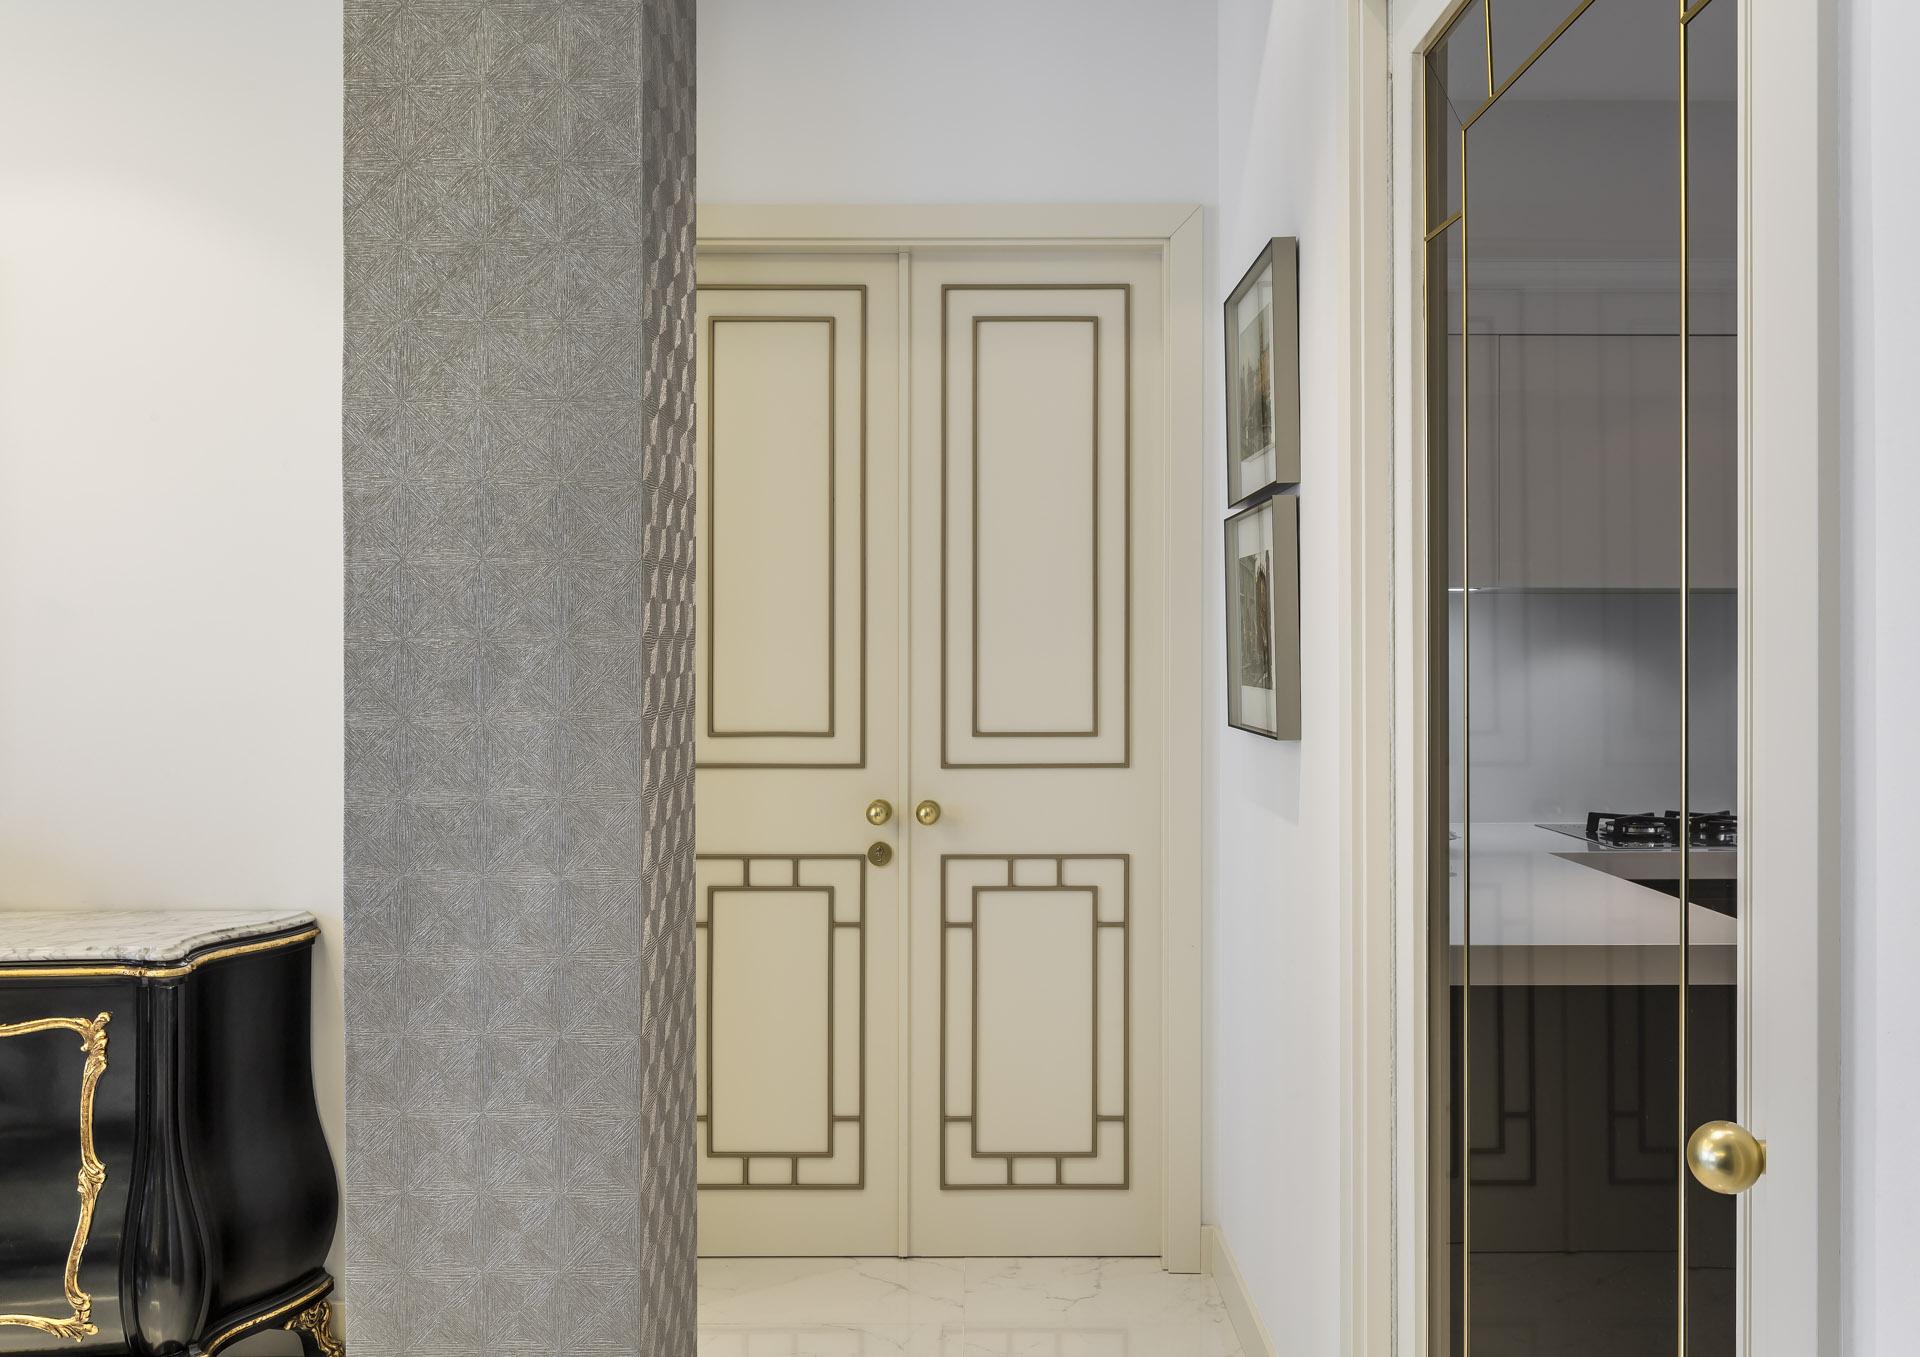 fotografia-arquitectura-valencia-interiorismo-german-cabo-laura-yerpes-apartamento-07